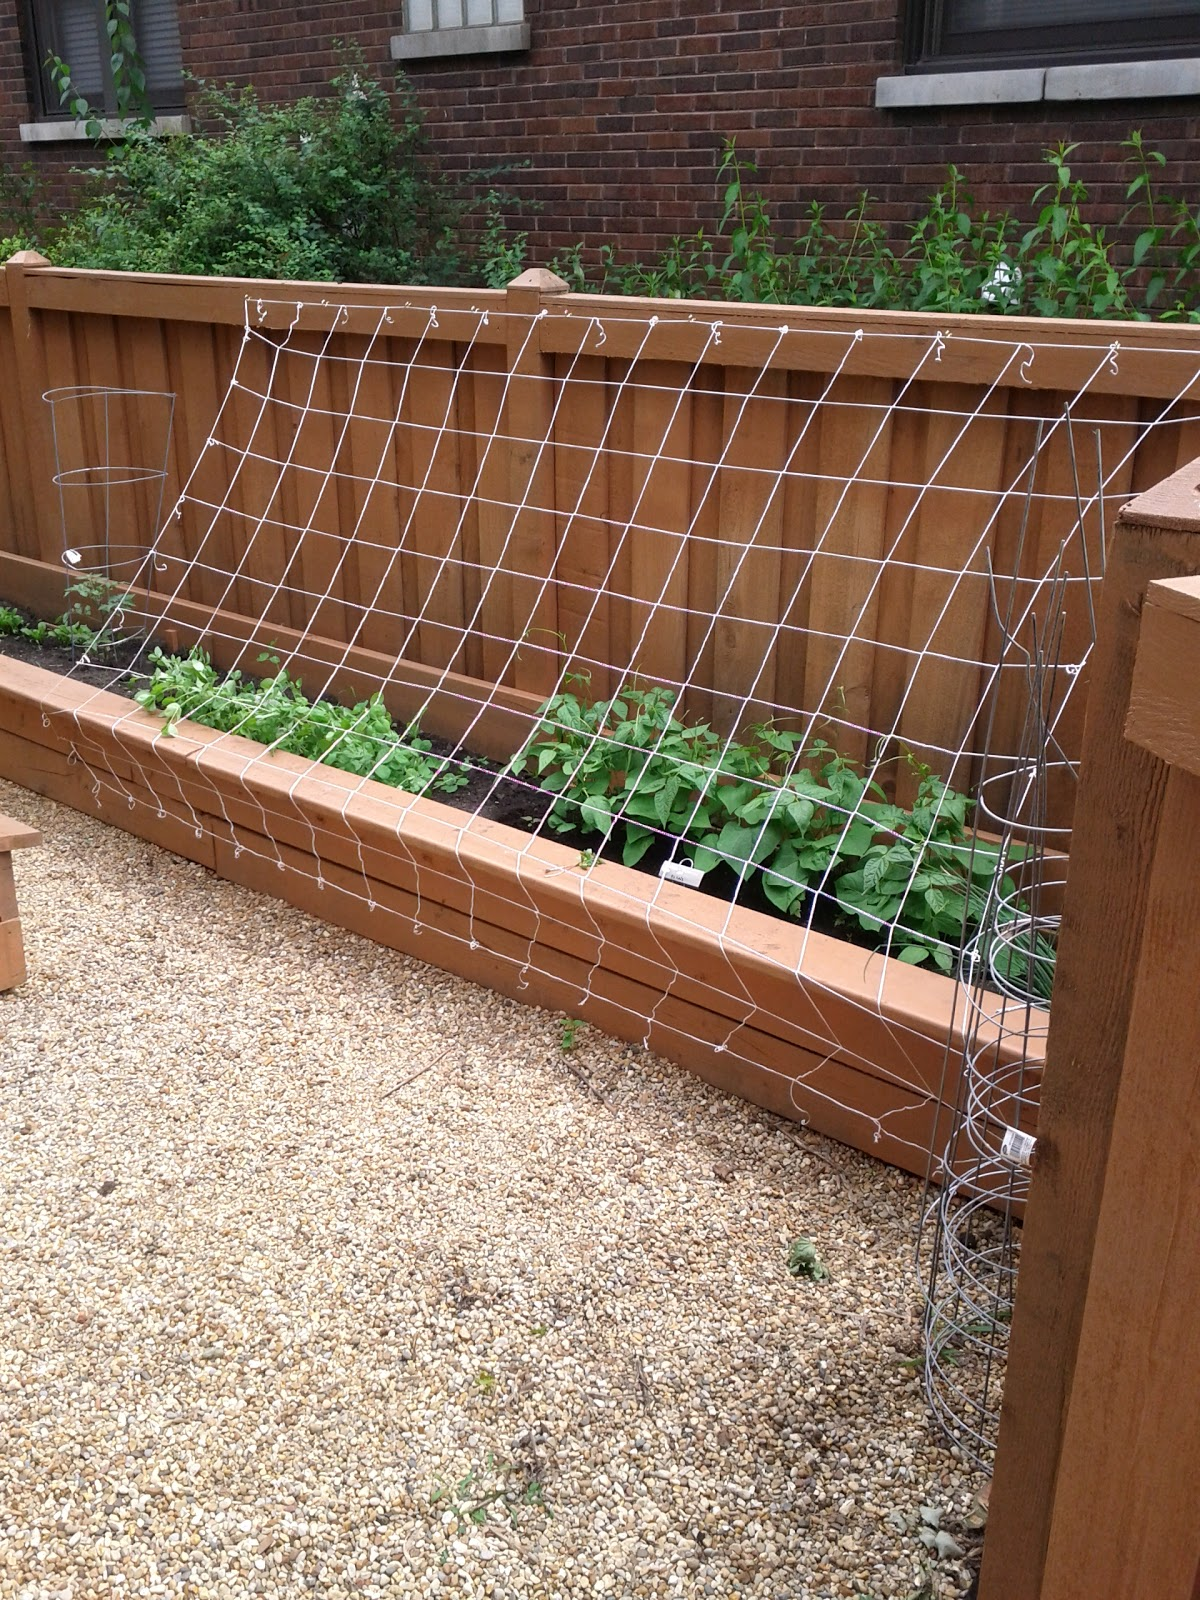 green bean trellis installed 2011